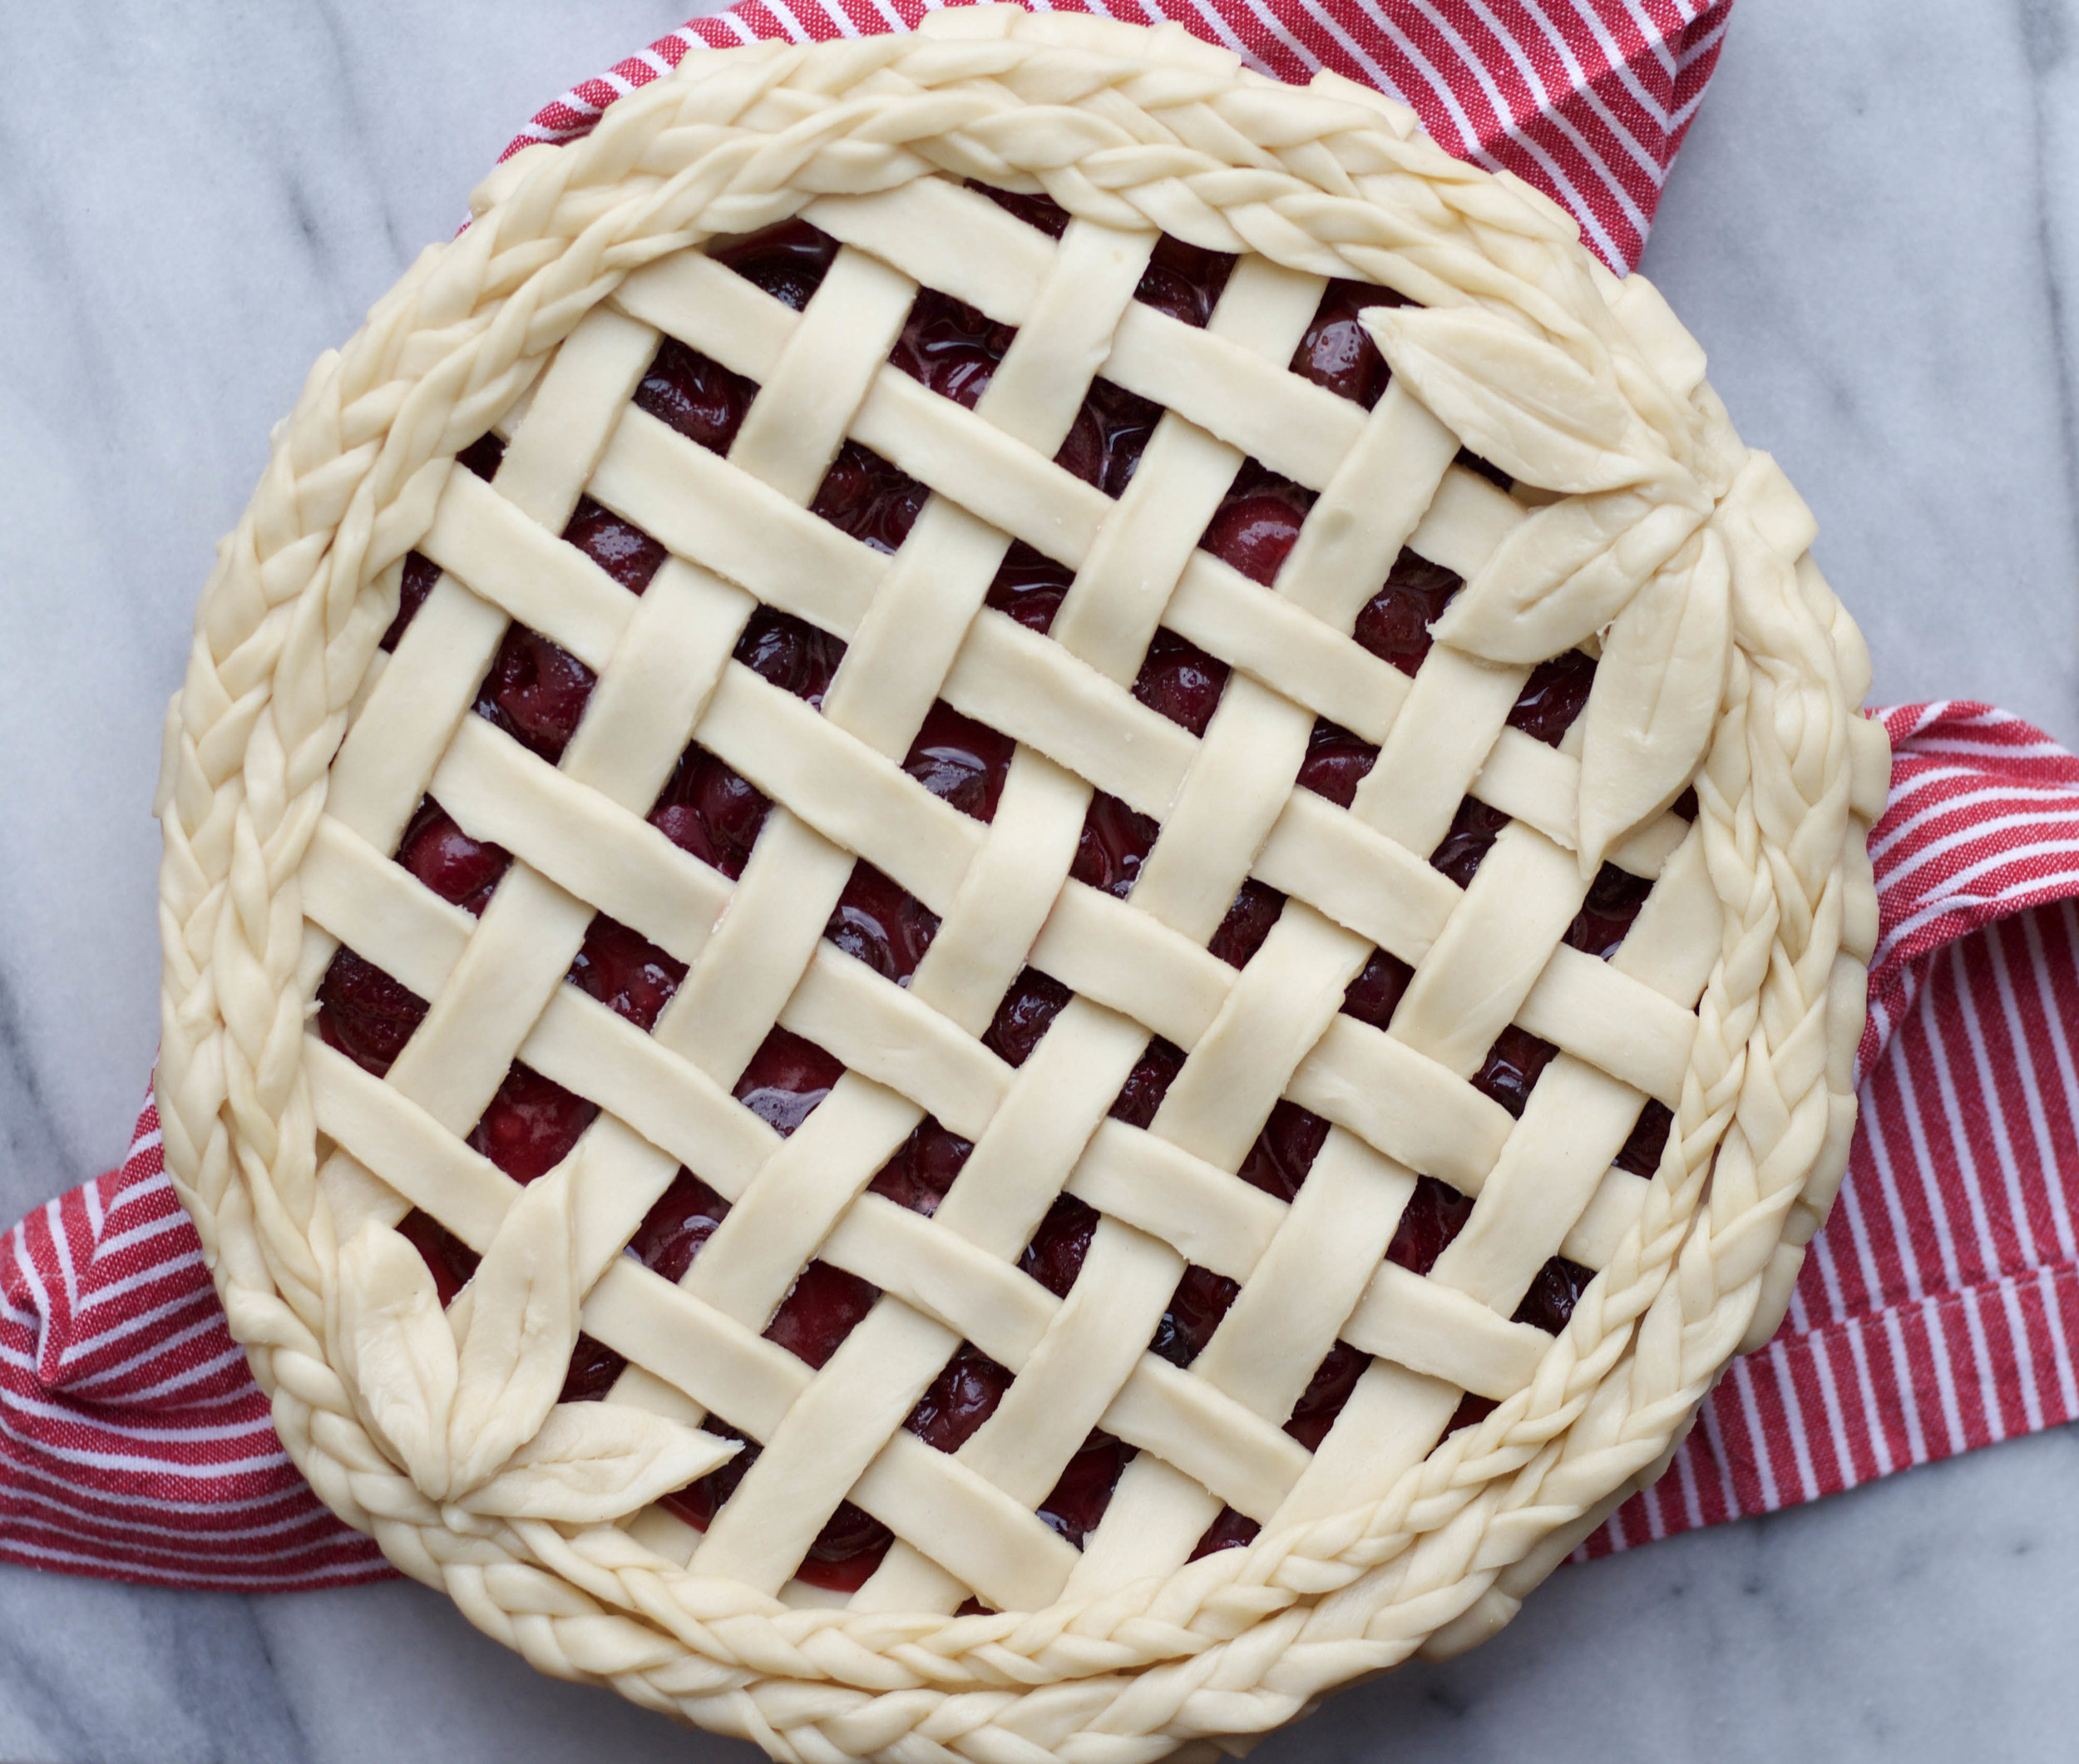 Cherry Pie with Braided Lattice Crust